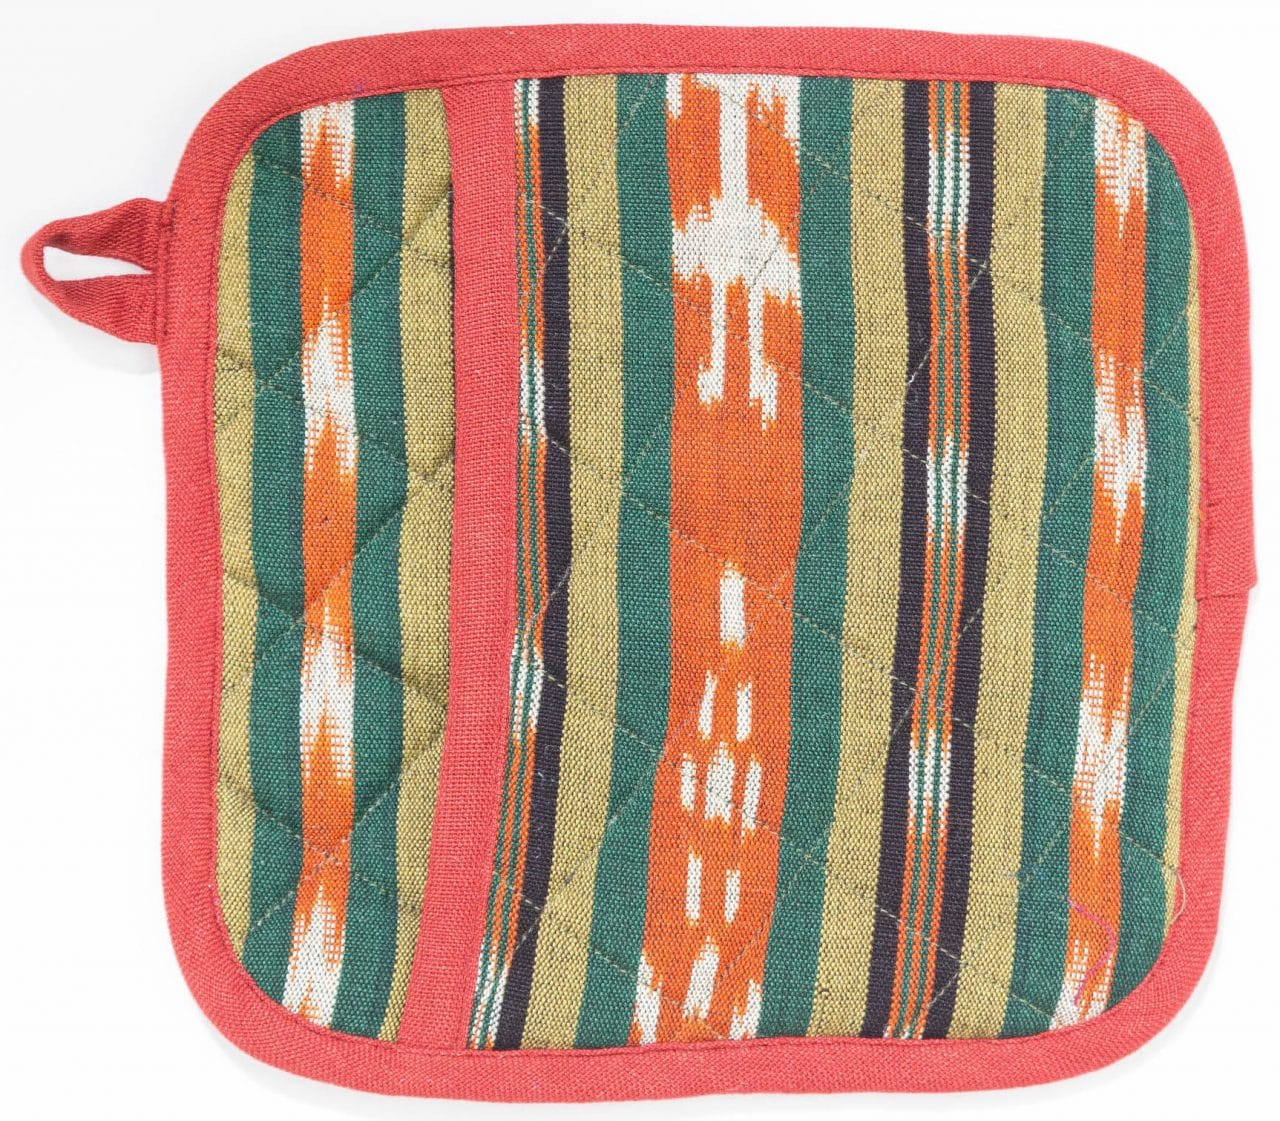 Pocket Pot Holder - A Variety of Colors